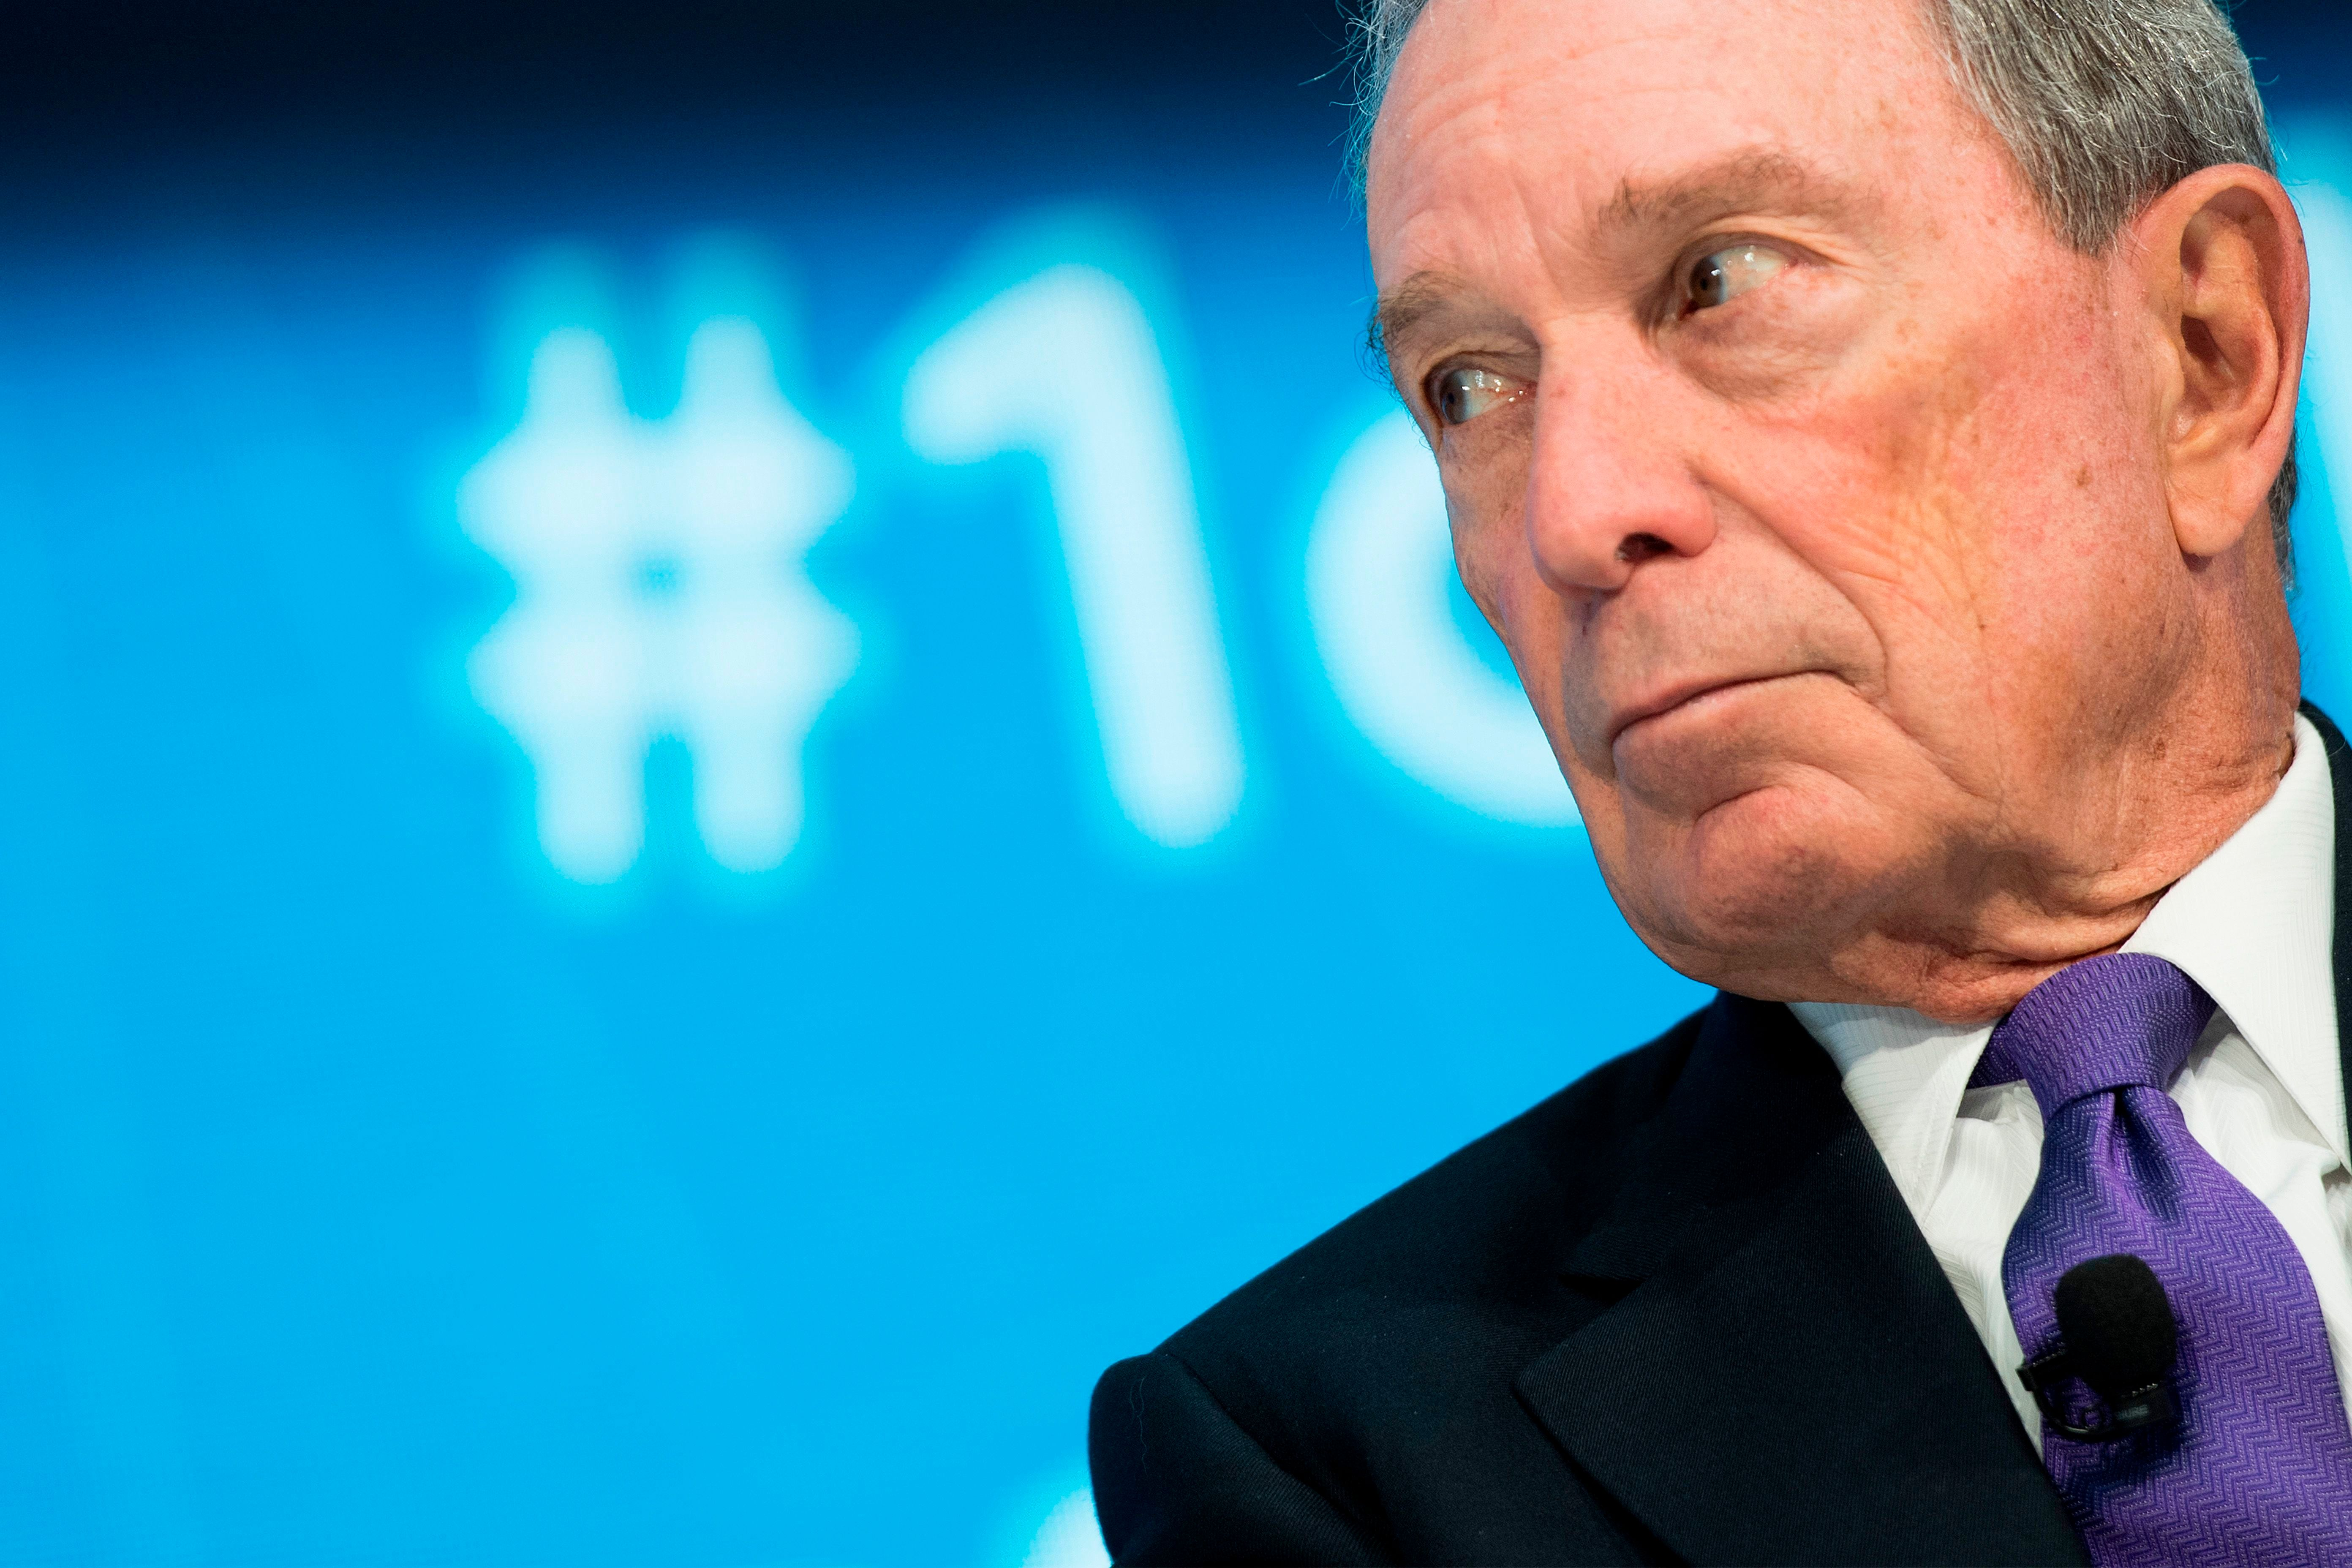 Former New York City Mayor Mike Bloomberg speaks at the International Monetary Fundin Washington, D.C., on April 19, 20